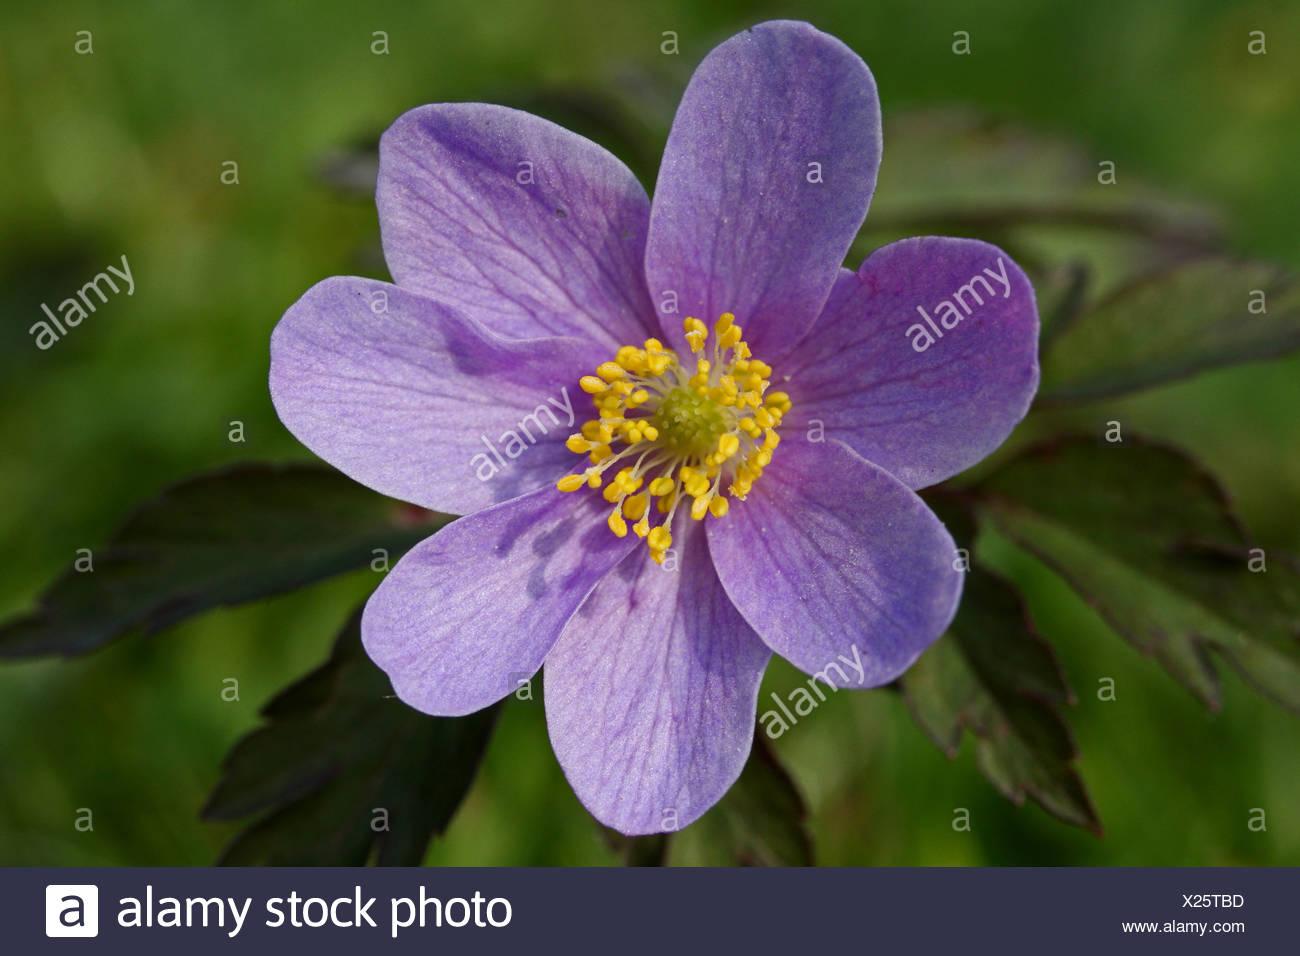 close-up bovenaanzicht lila 7-tallige bloem - Stock Image